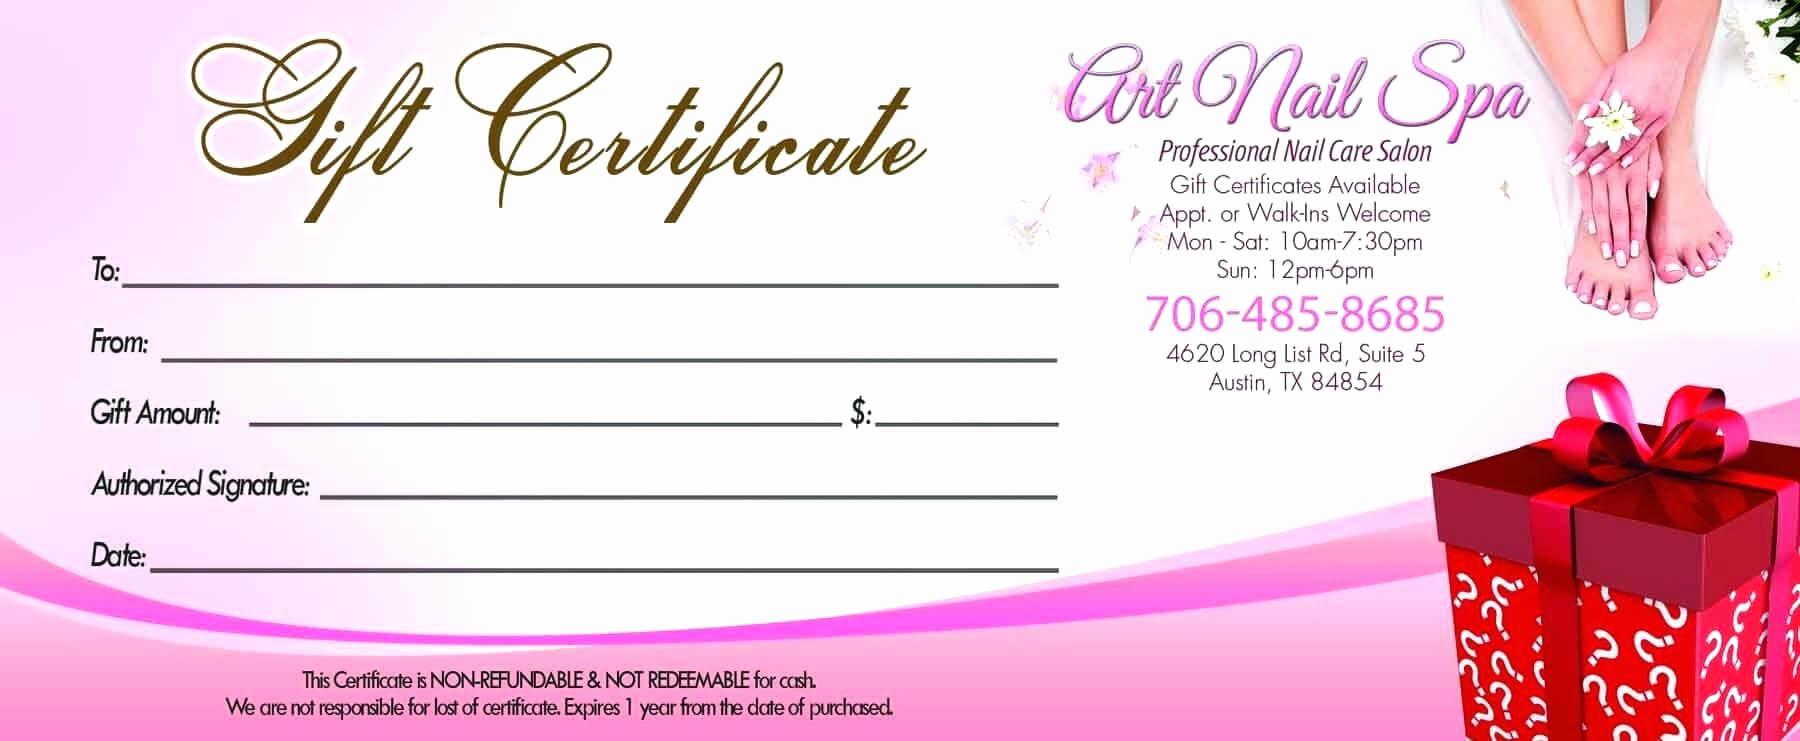 Free Printable Hair Salon Gift Certificate Template | Mult Within Nail Gift Certificate Template Free